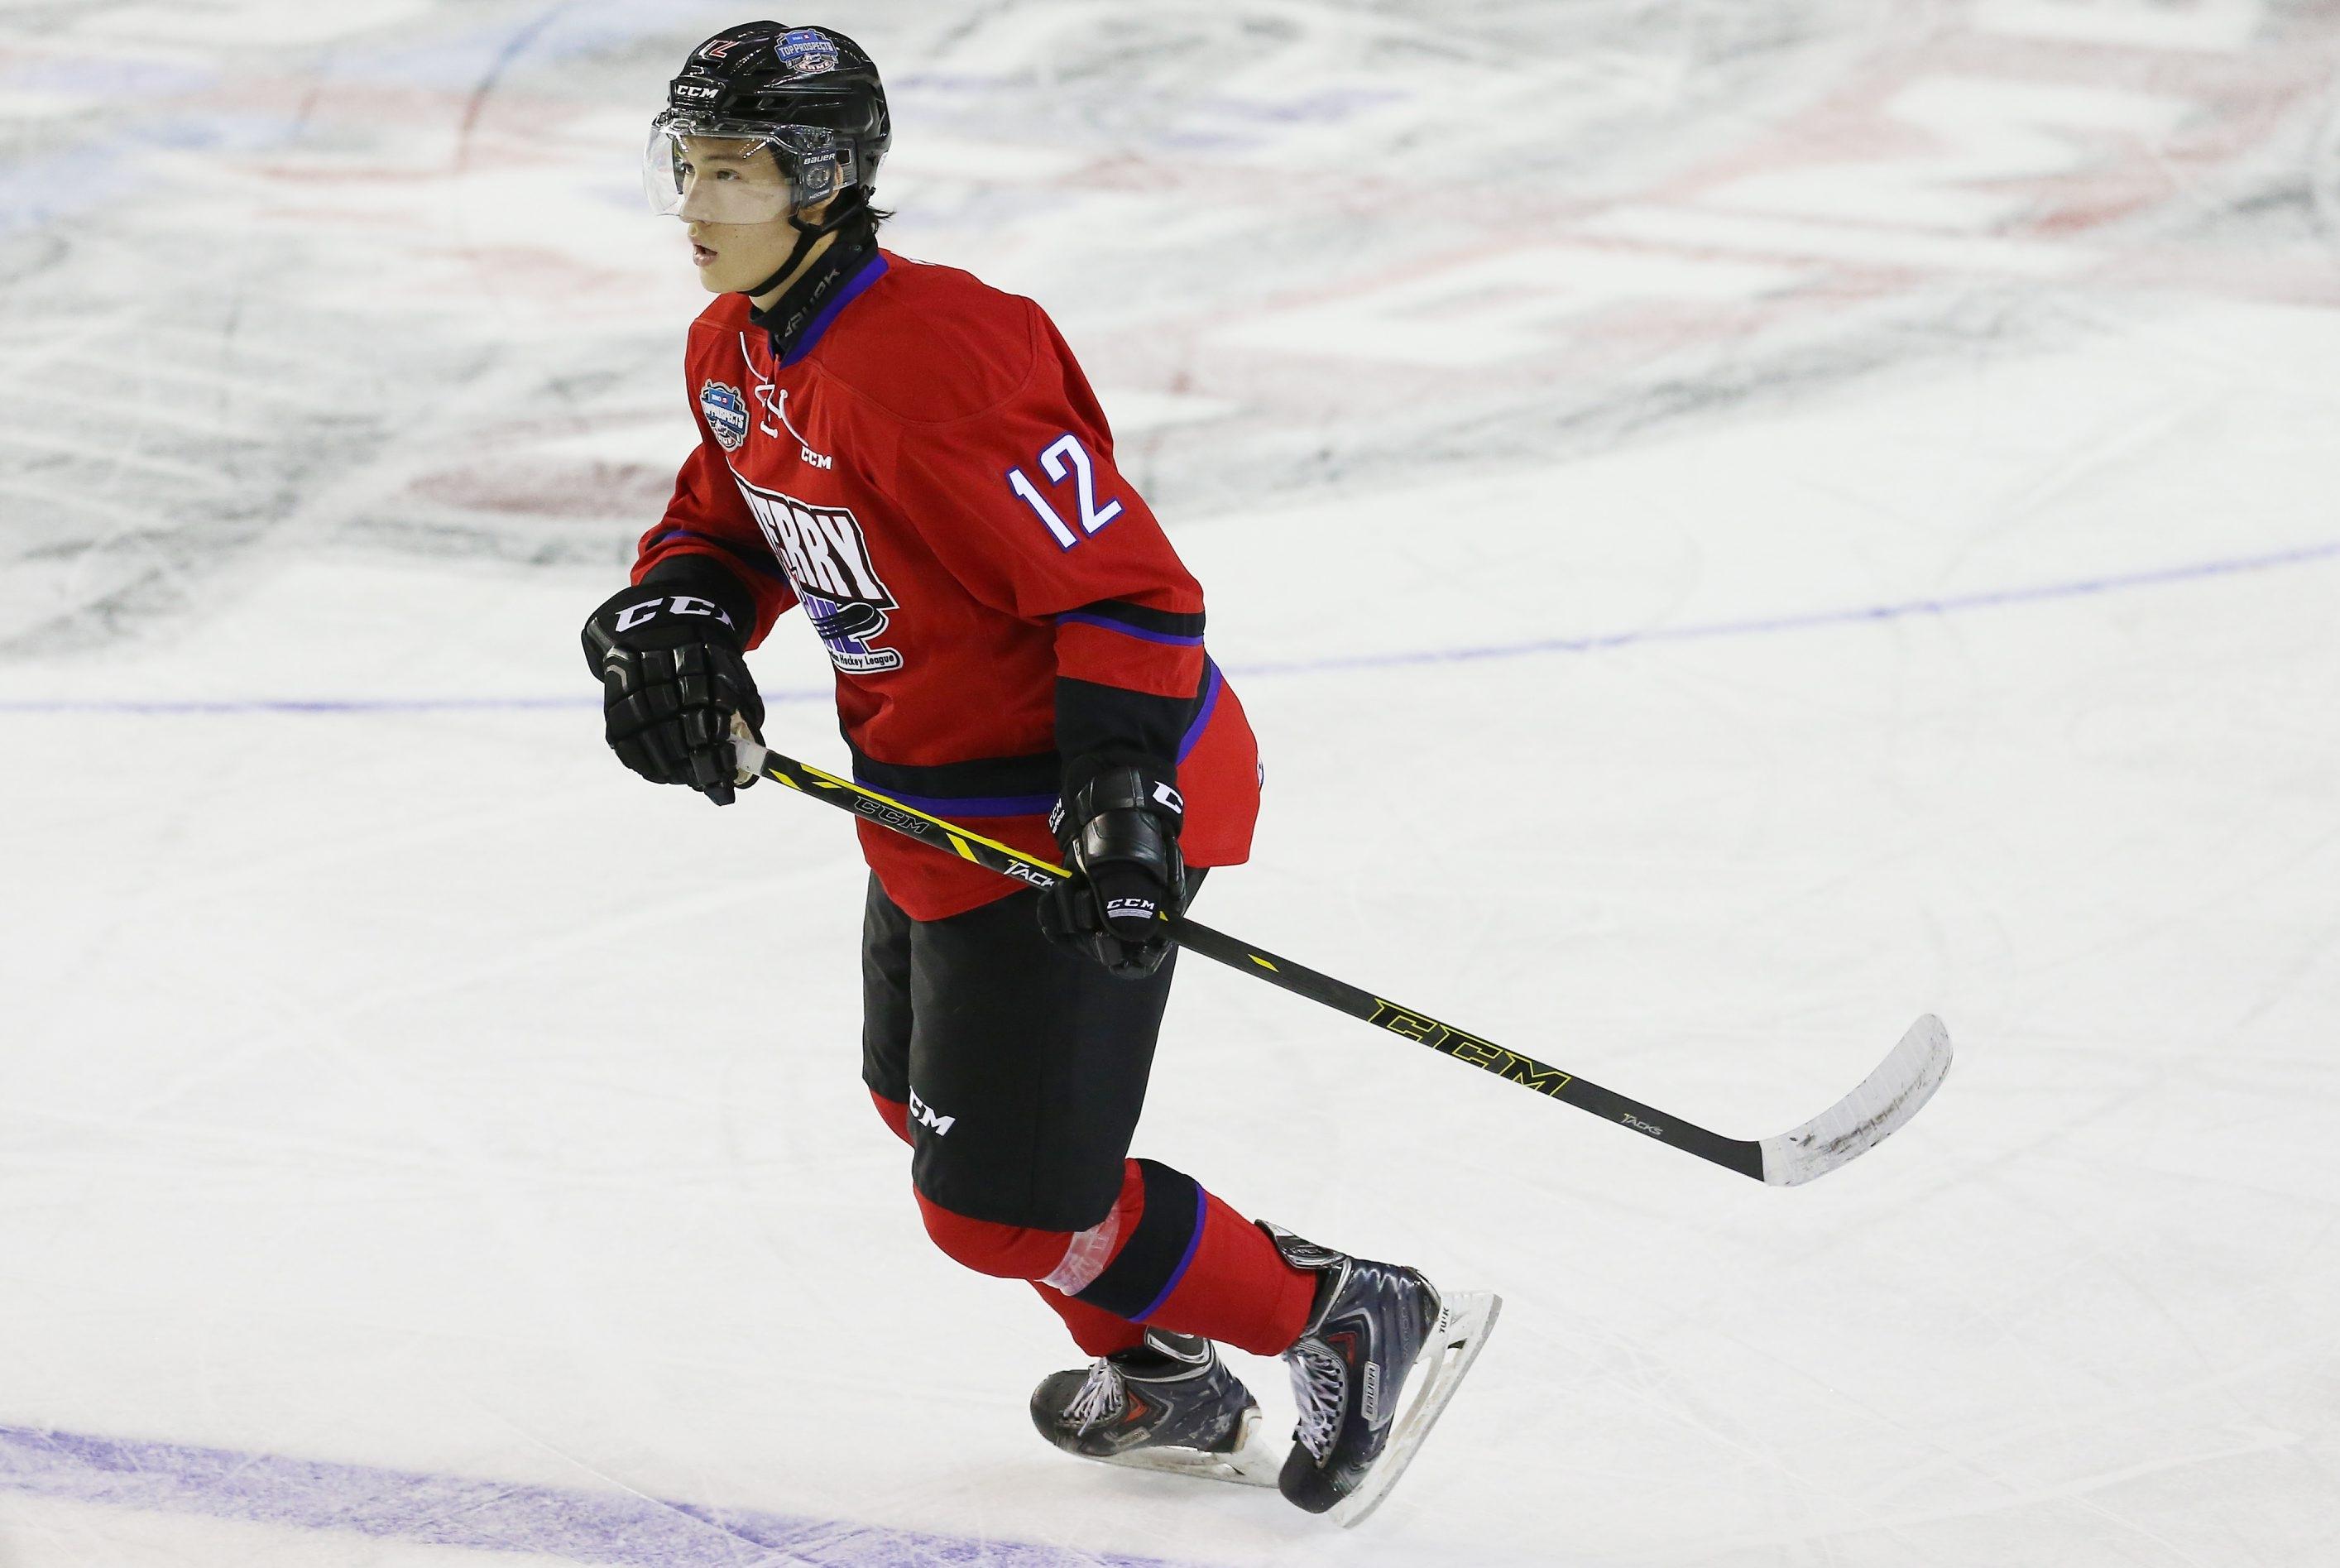 Dennis Yan has an NHL-caliber wrist shot, according to his coach from Shawinigan of the QMJHL.